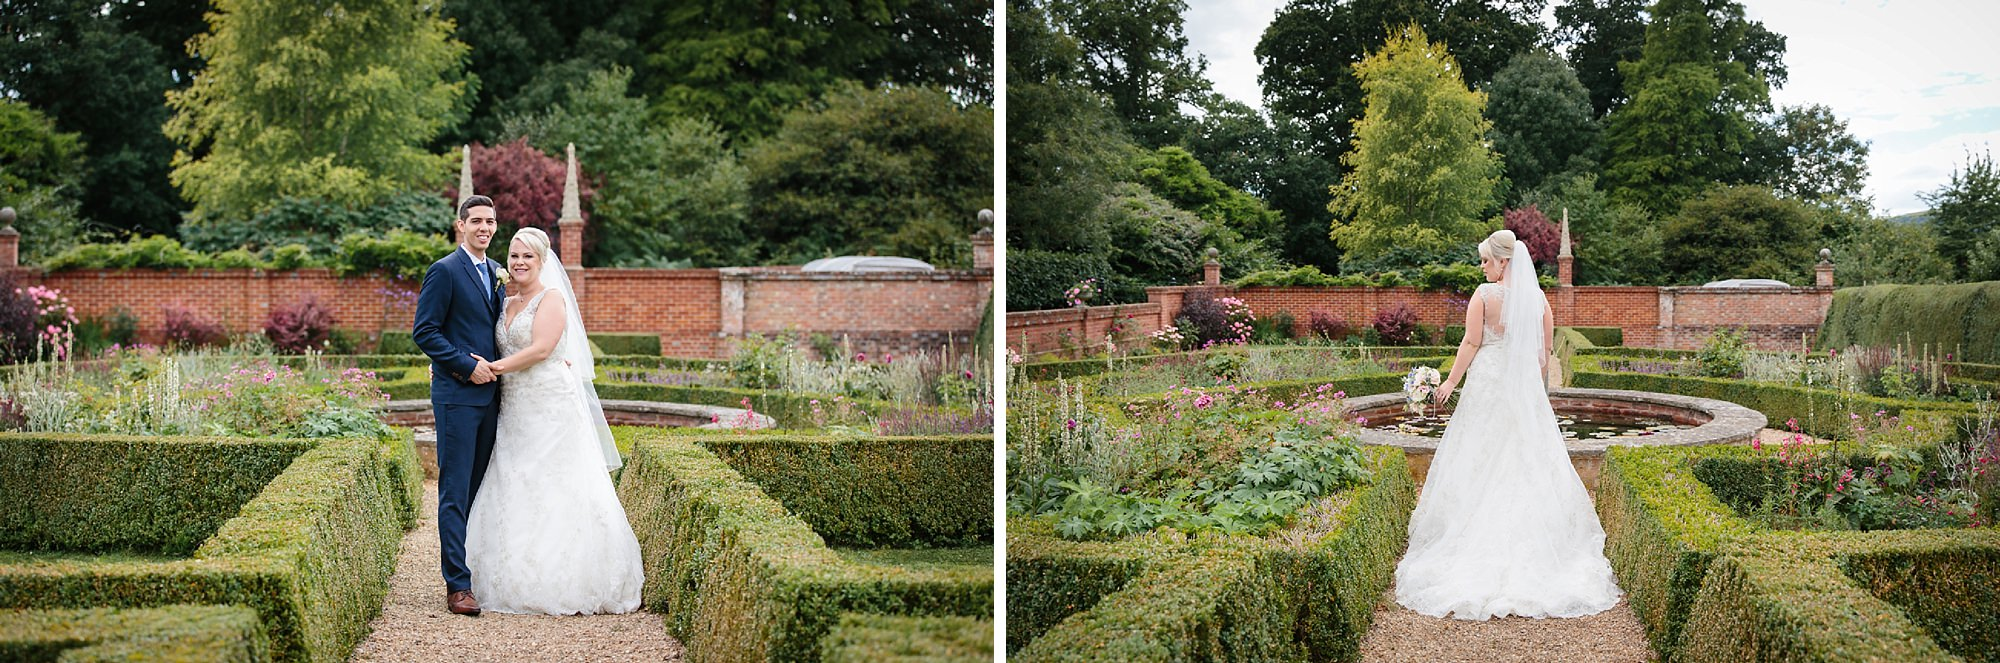 Bignor Park wedding photography garden portraits